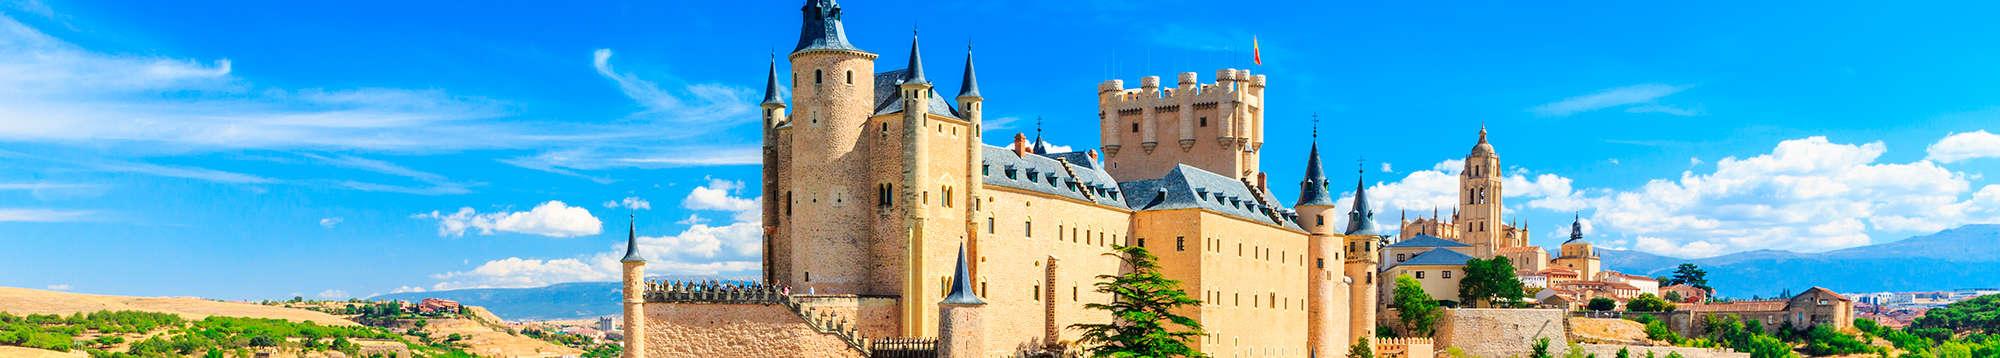 Escapadas fin de semana Castillos en Aragón